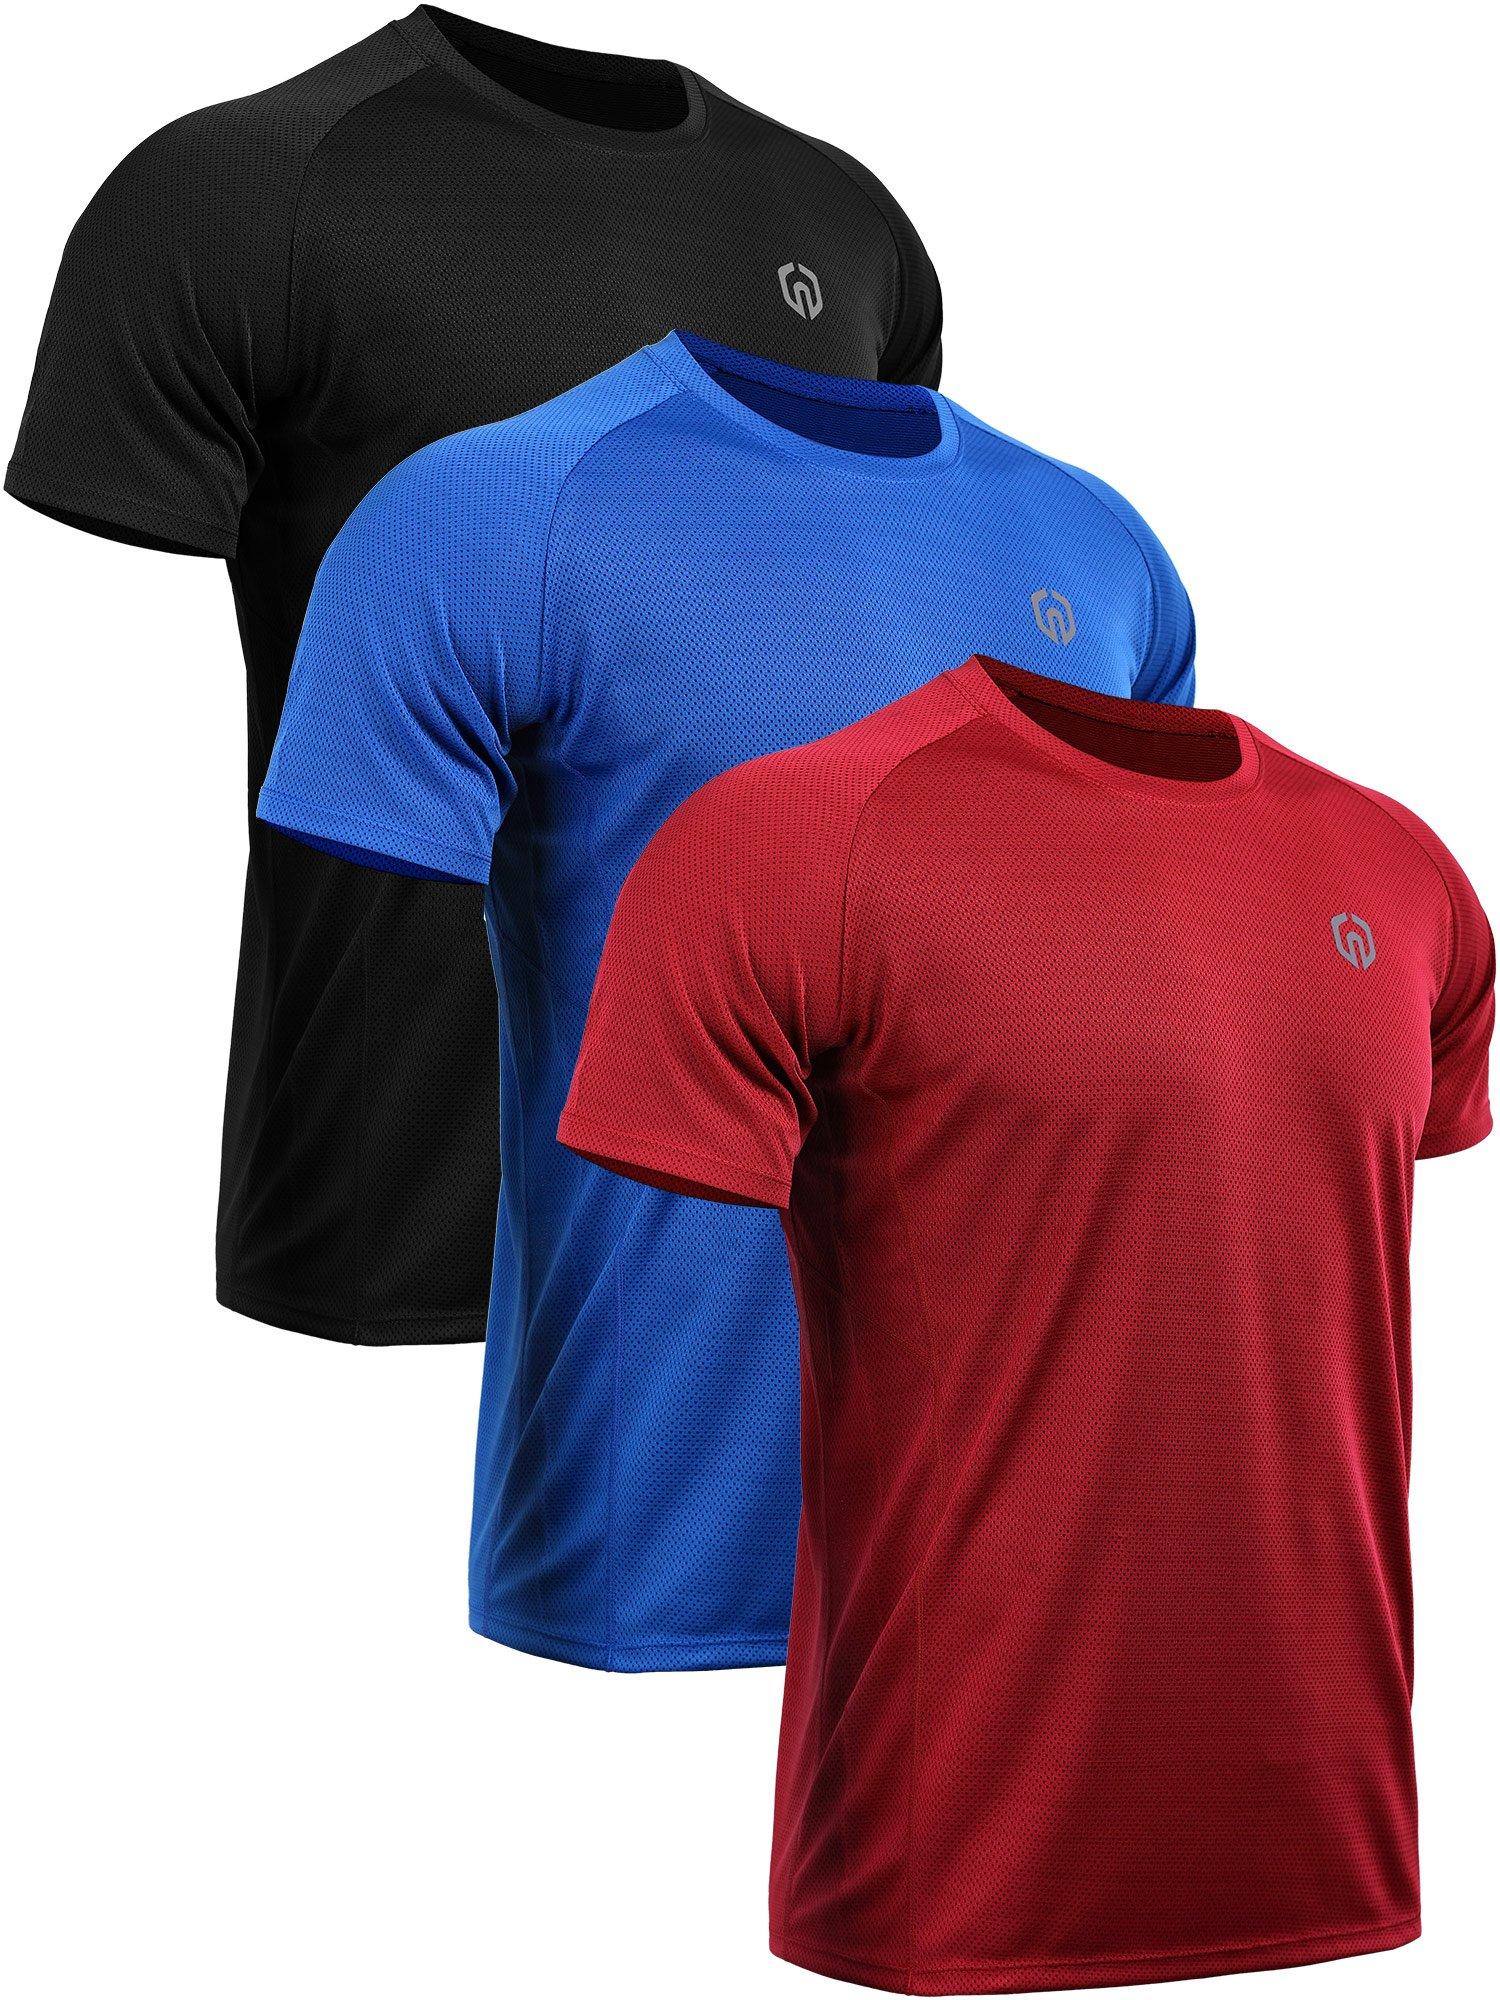 Neleus Men's 3 Pack Mesh Athletic Fitness Workout